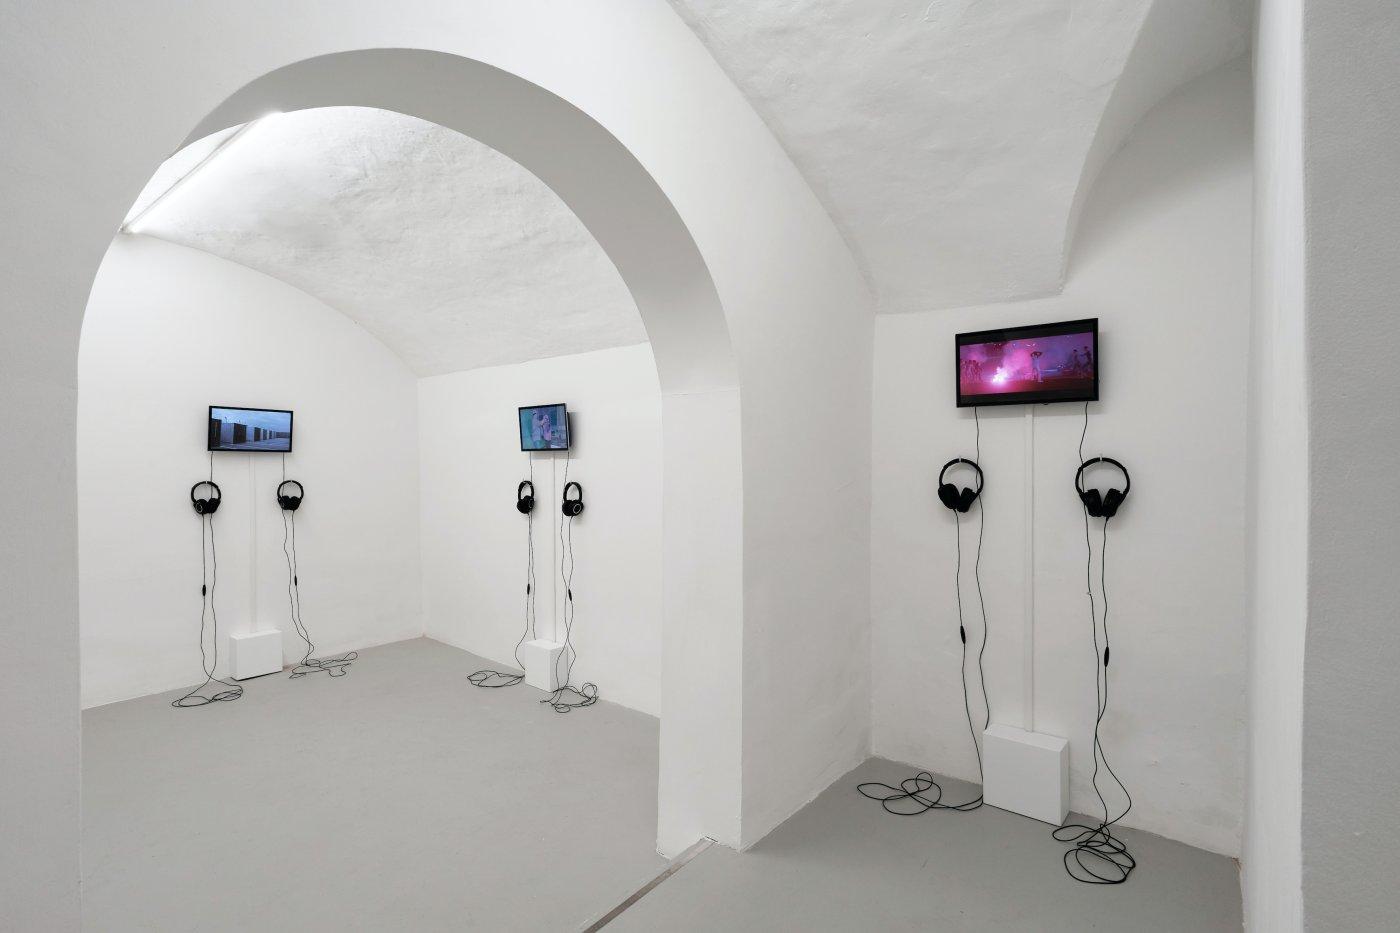 Galleria Continua San Gimignano JR 8